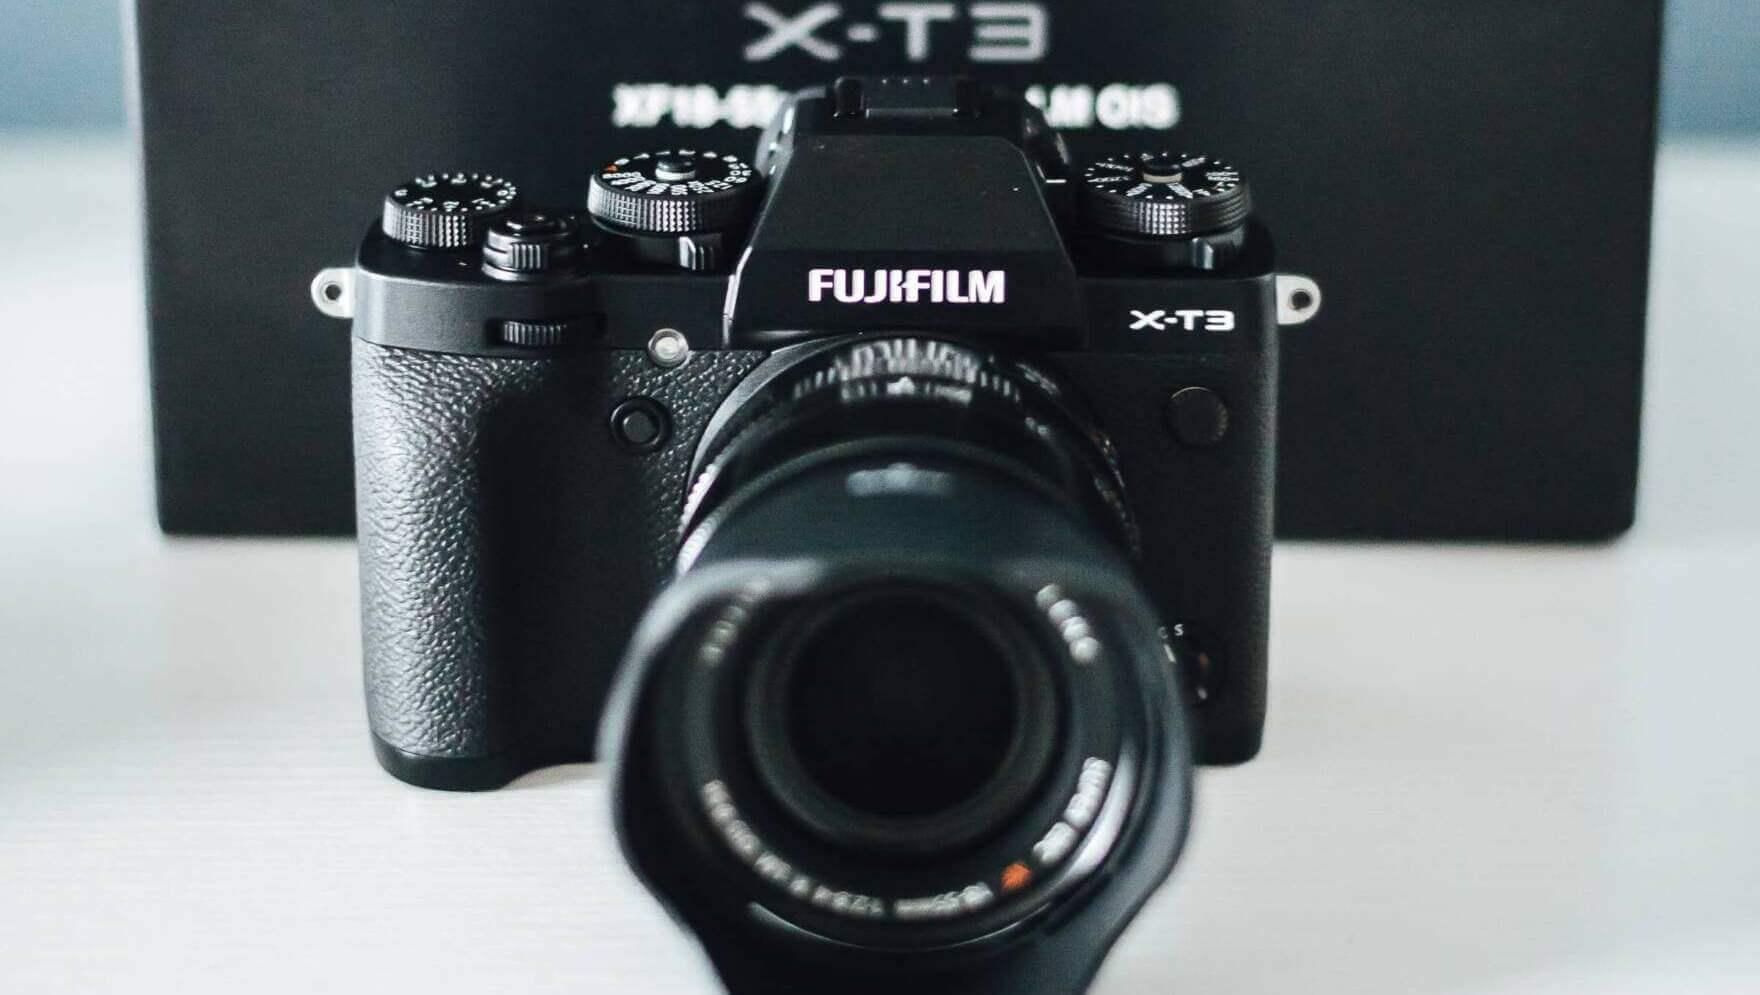 valokuvaus Fuji xt3